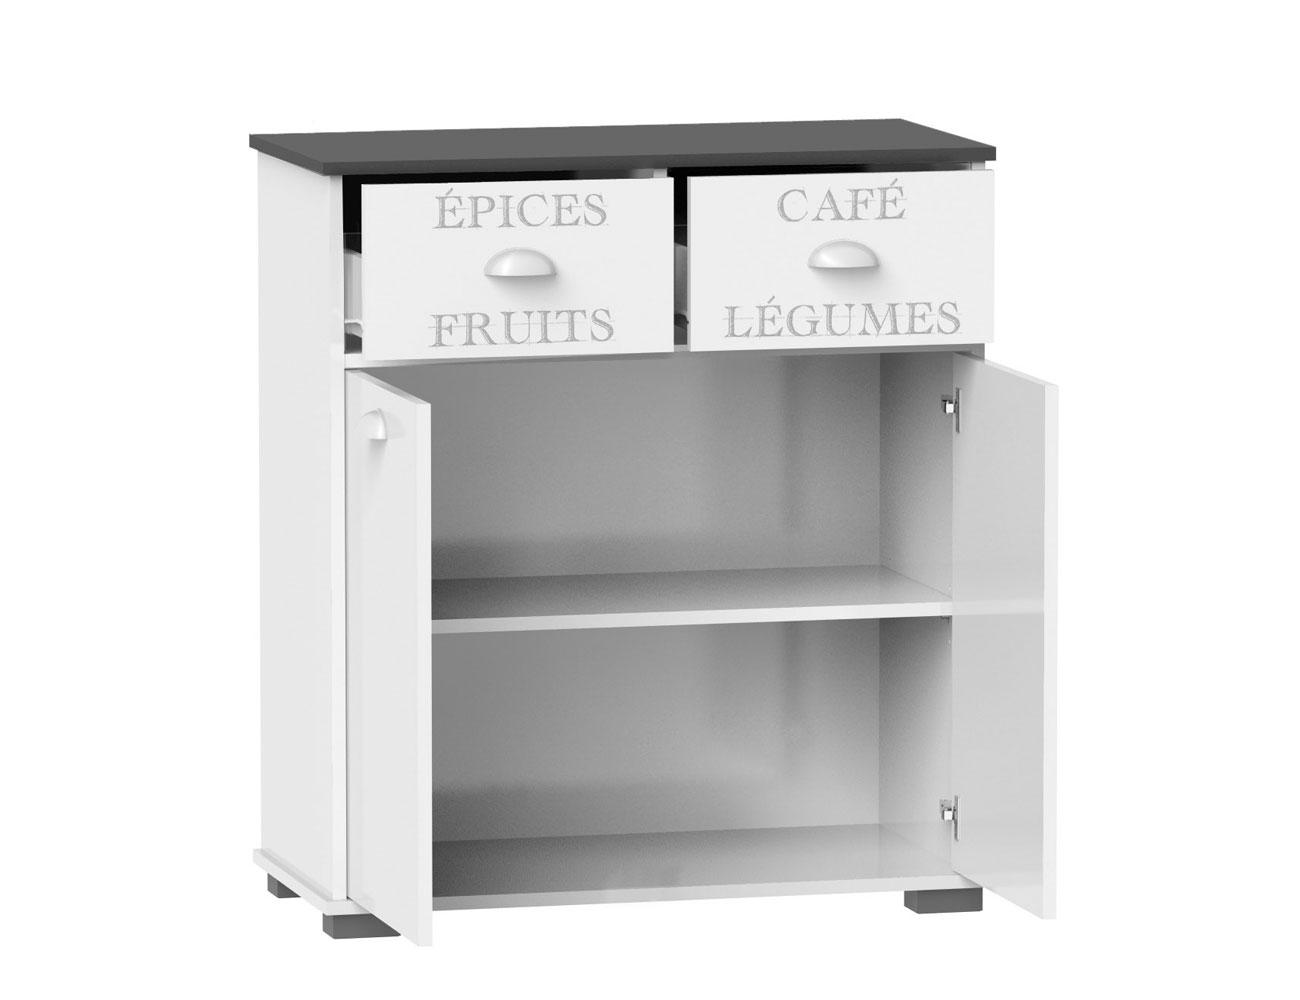 Mueble buffet de cocina de 90 cm de alto 3419 factory for Manual para muebles de cocina